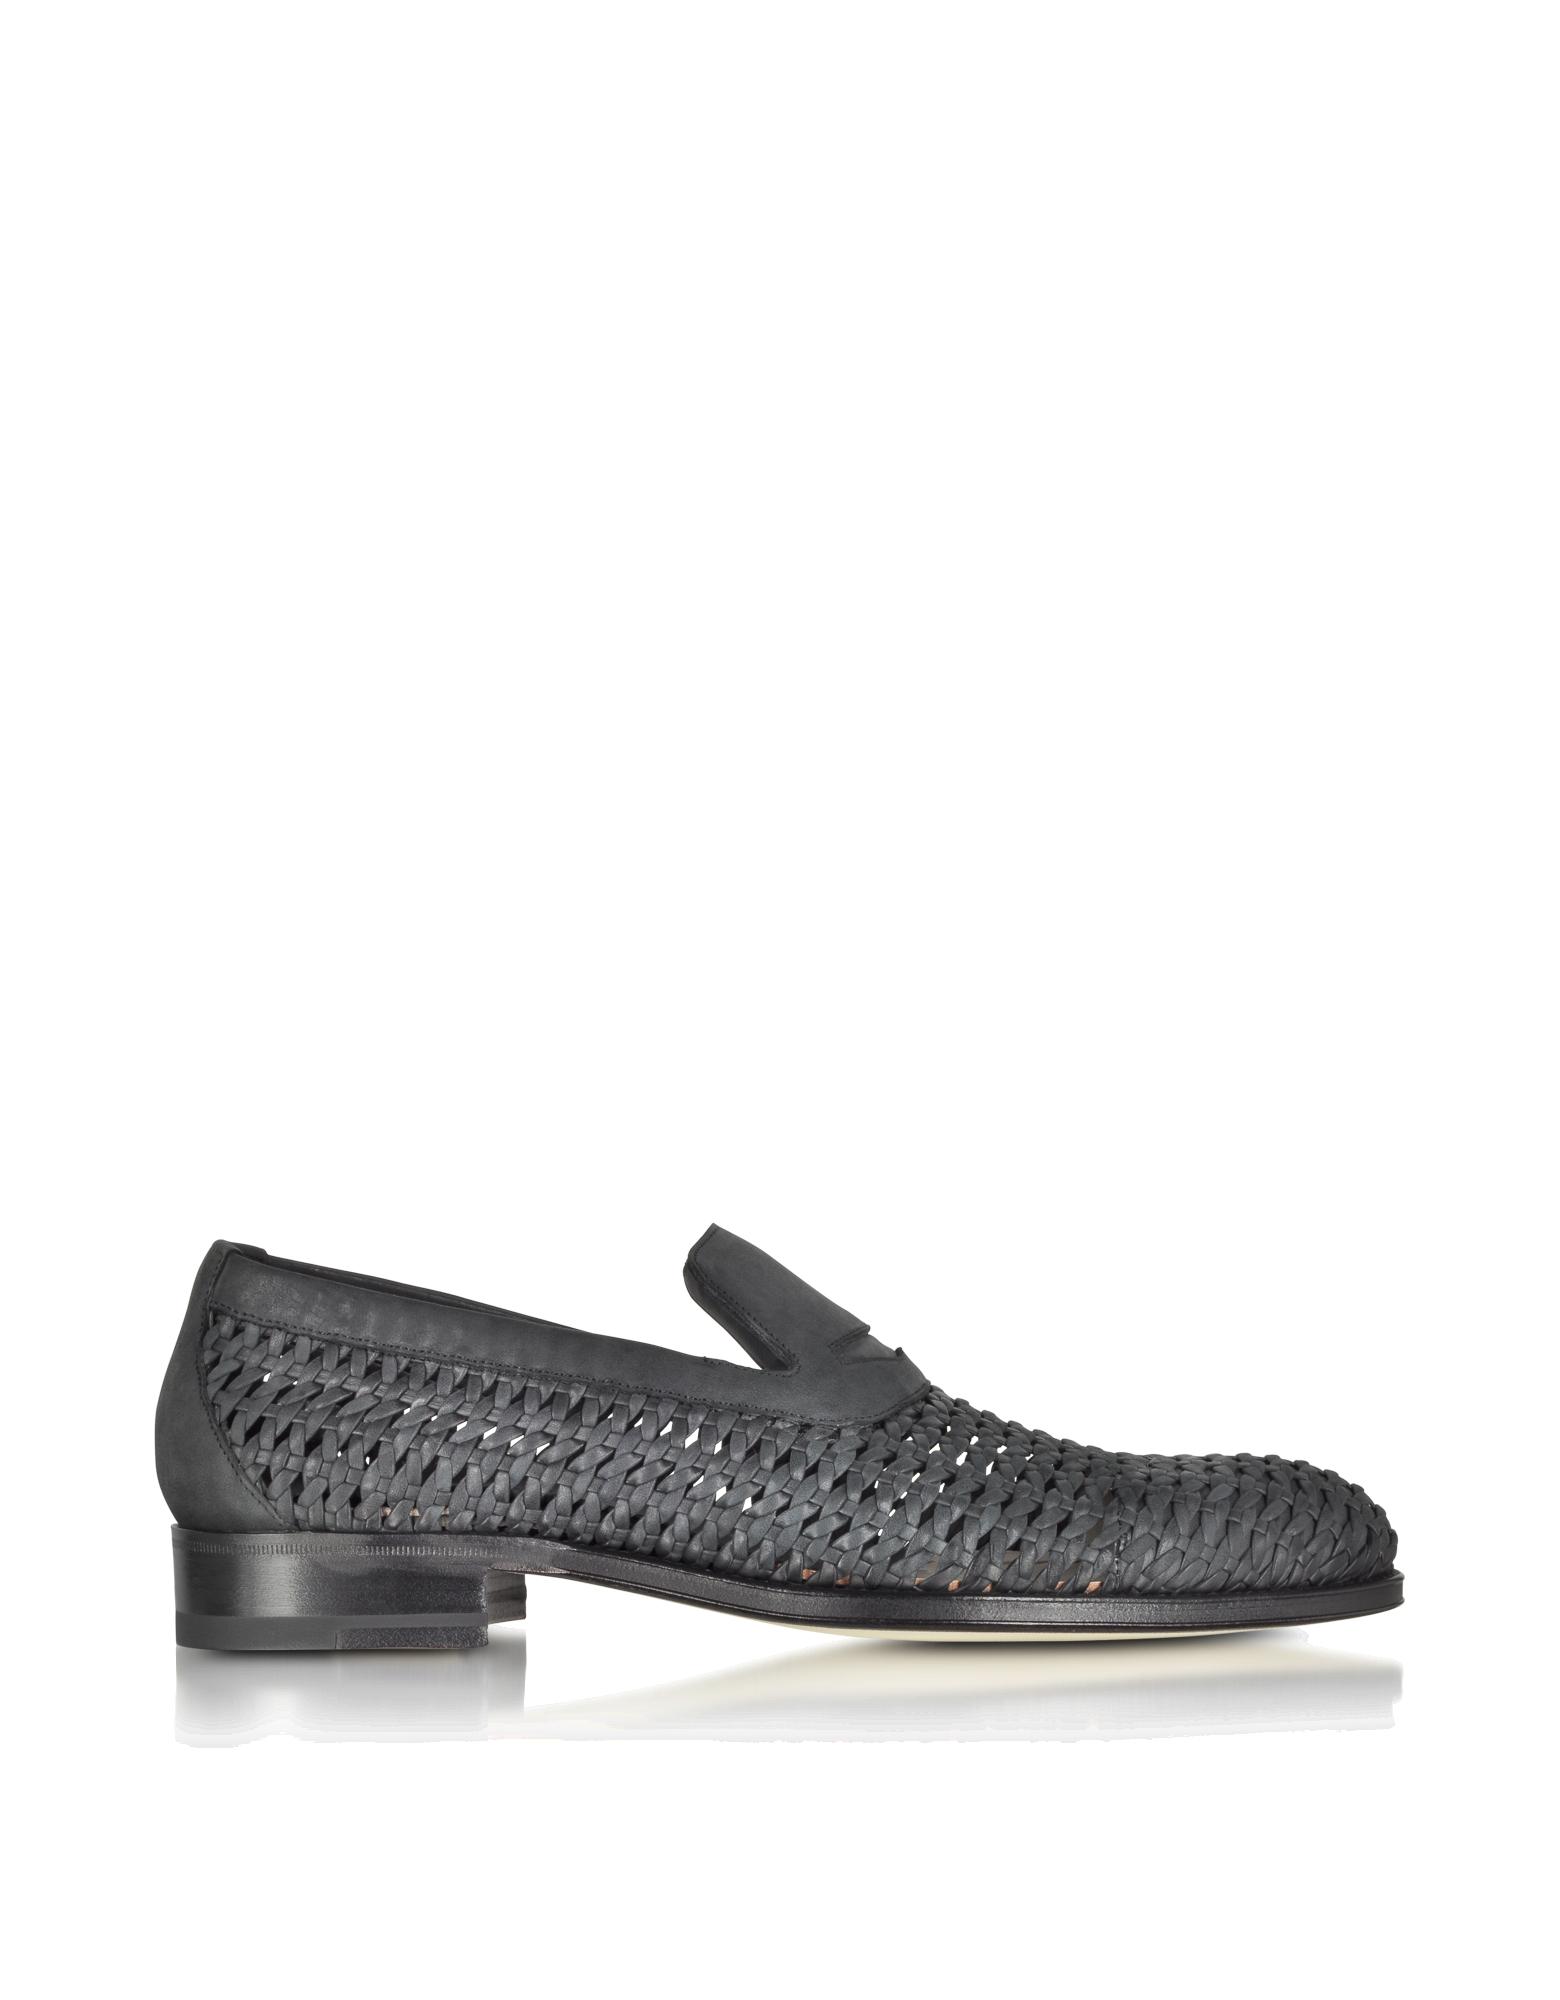 Image of Black Woven Leather Slip-on Shoe